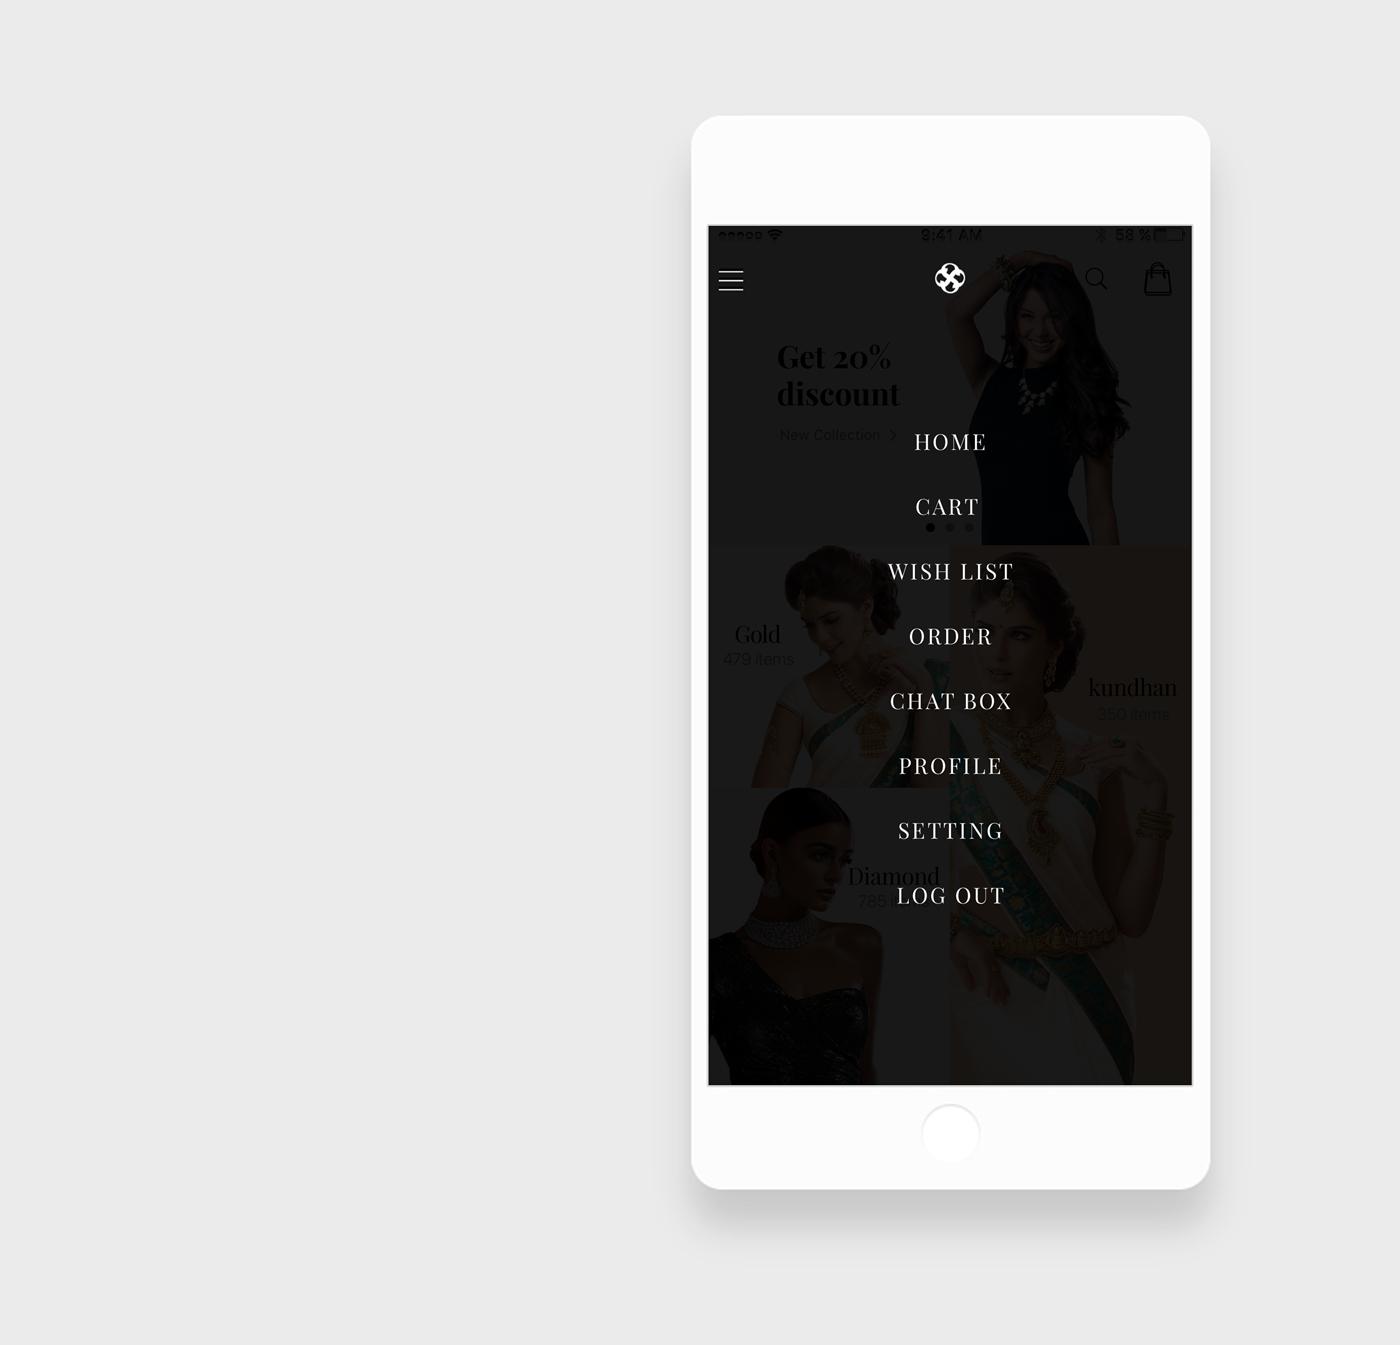 Jewellery%2BApp%2Bmenu%2BUI%2BDesigns Jewellery App UI Designs download